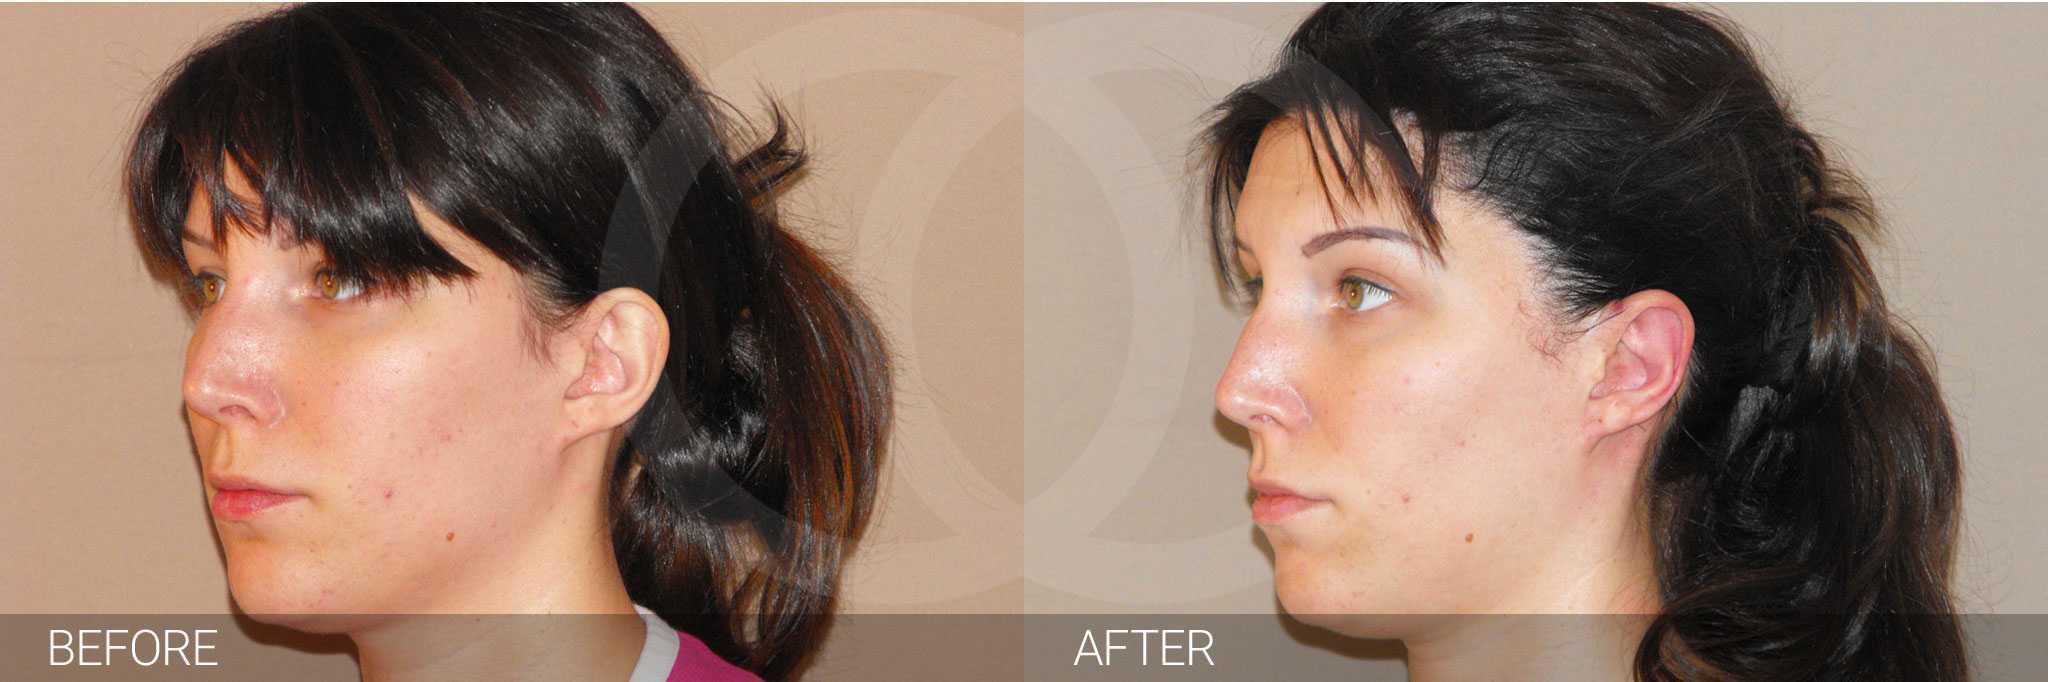 Chirurgie des oreilles 3 ante/post-op III